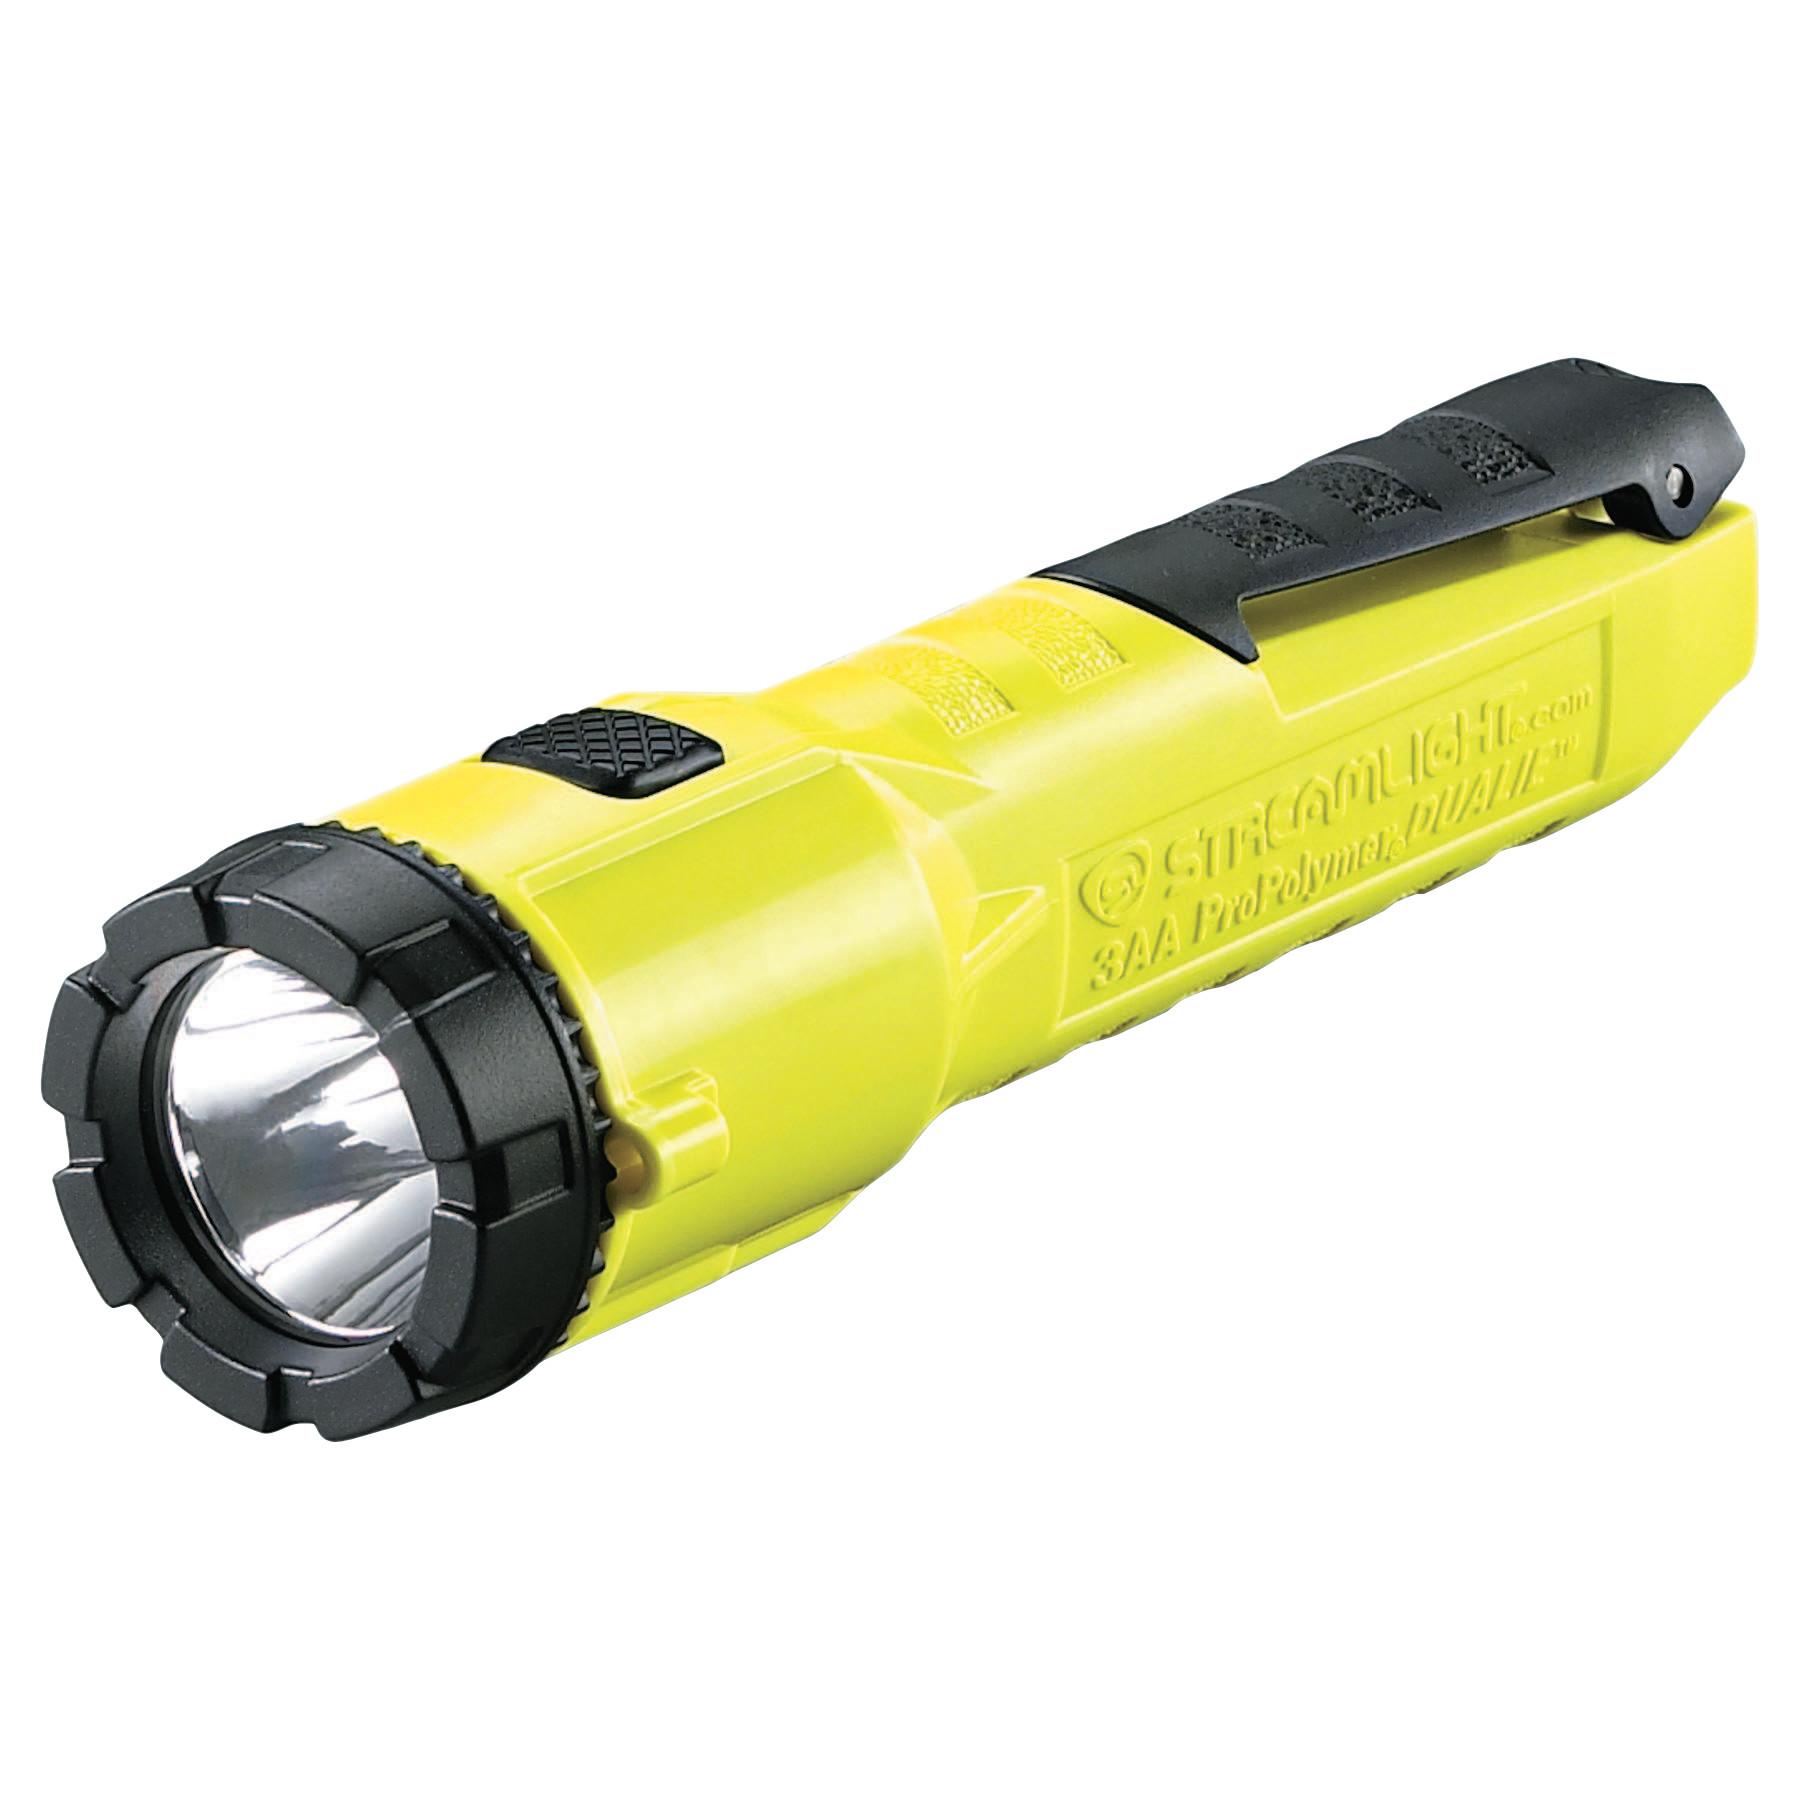 Streamlight ProPolymer Dualie Flashlight, w/3 AA Alkaline Batteries, Spot/Flood, Yellow